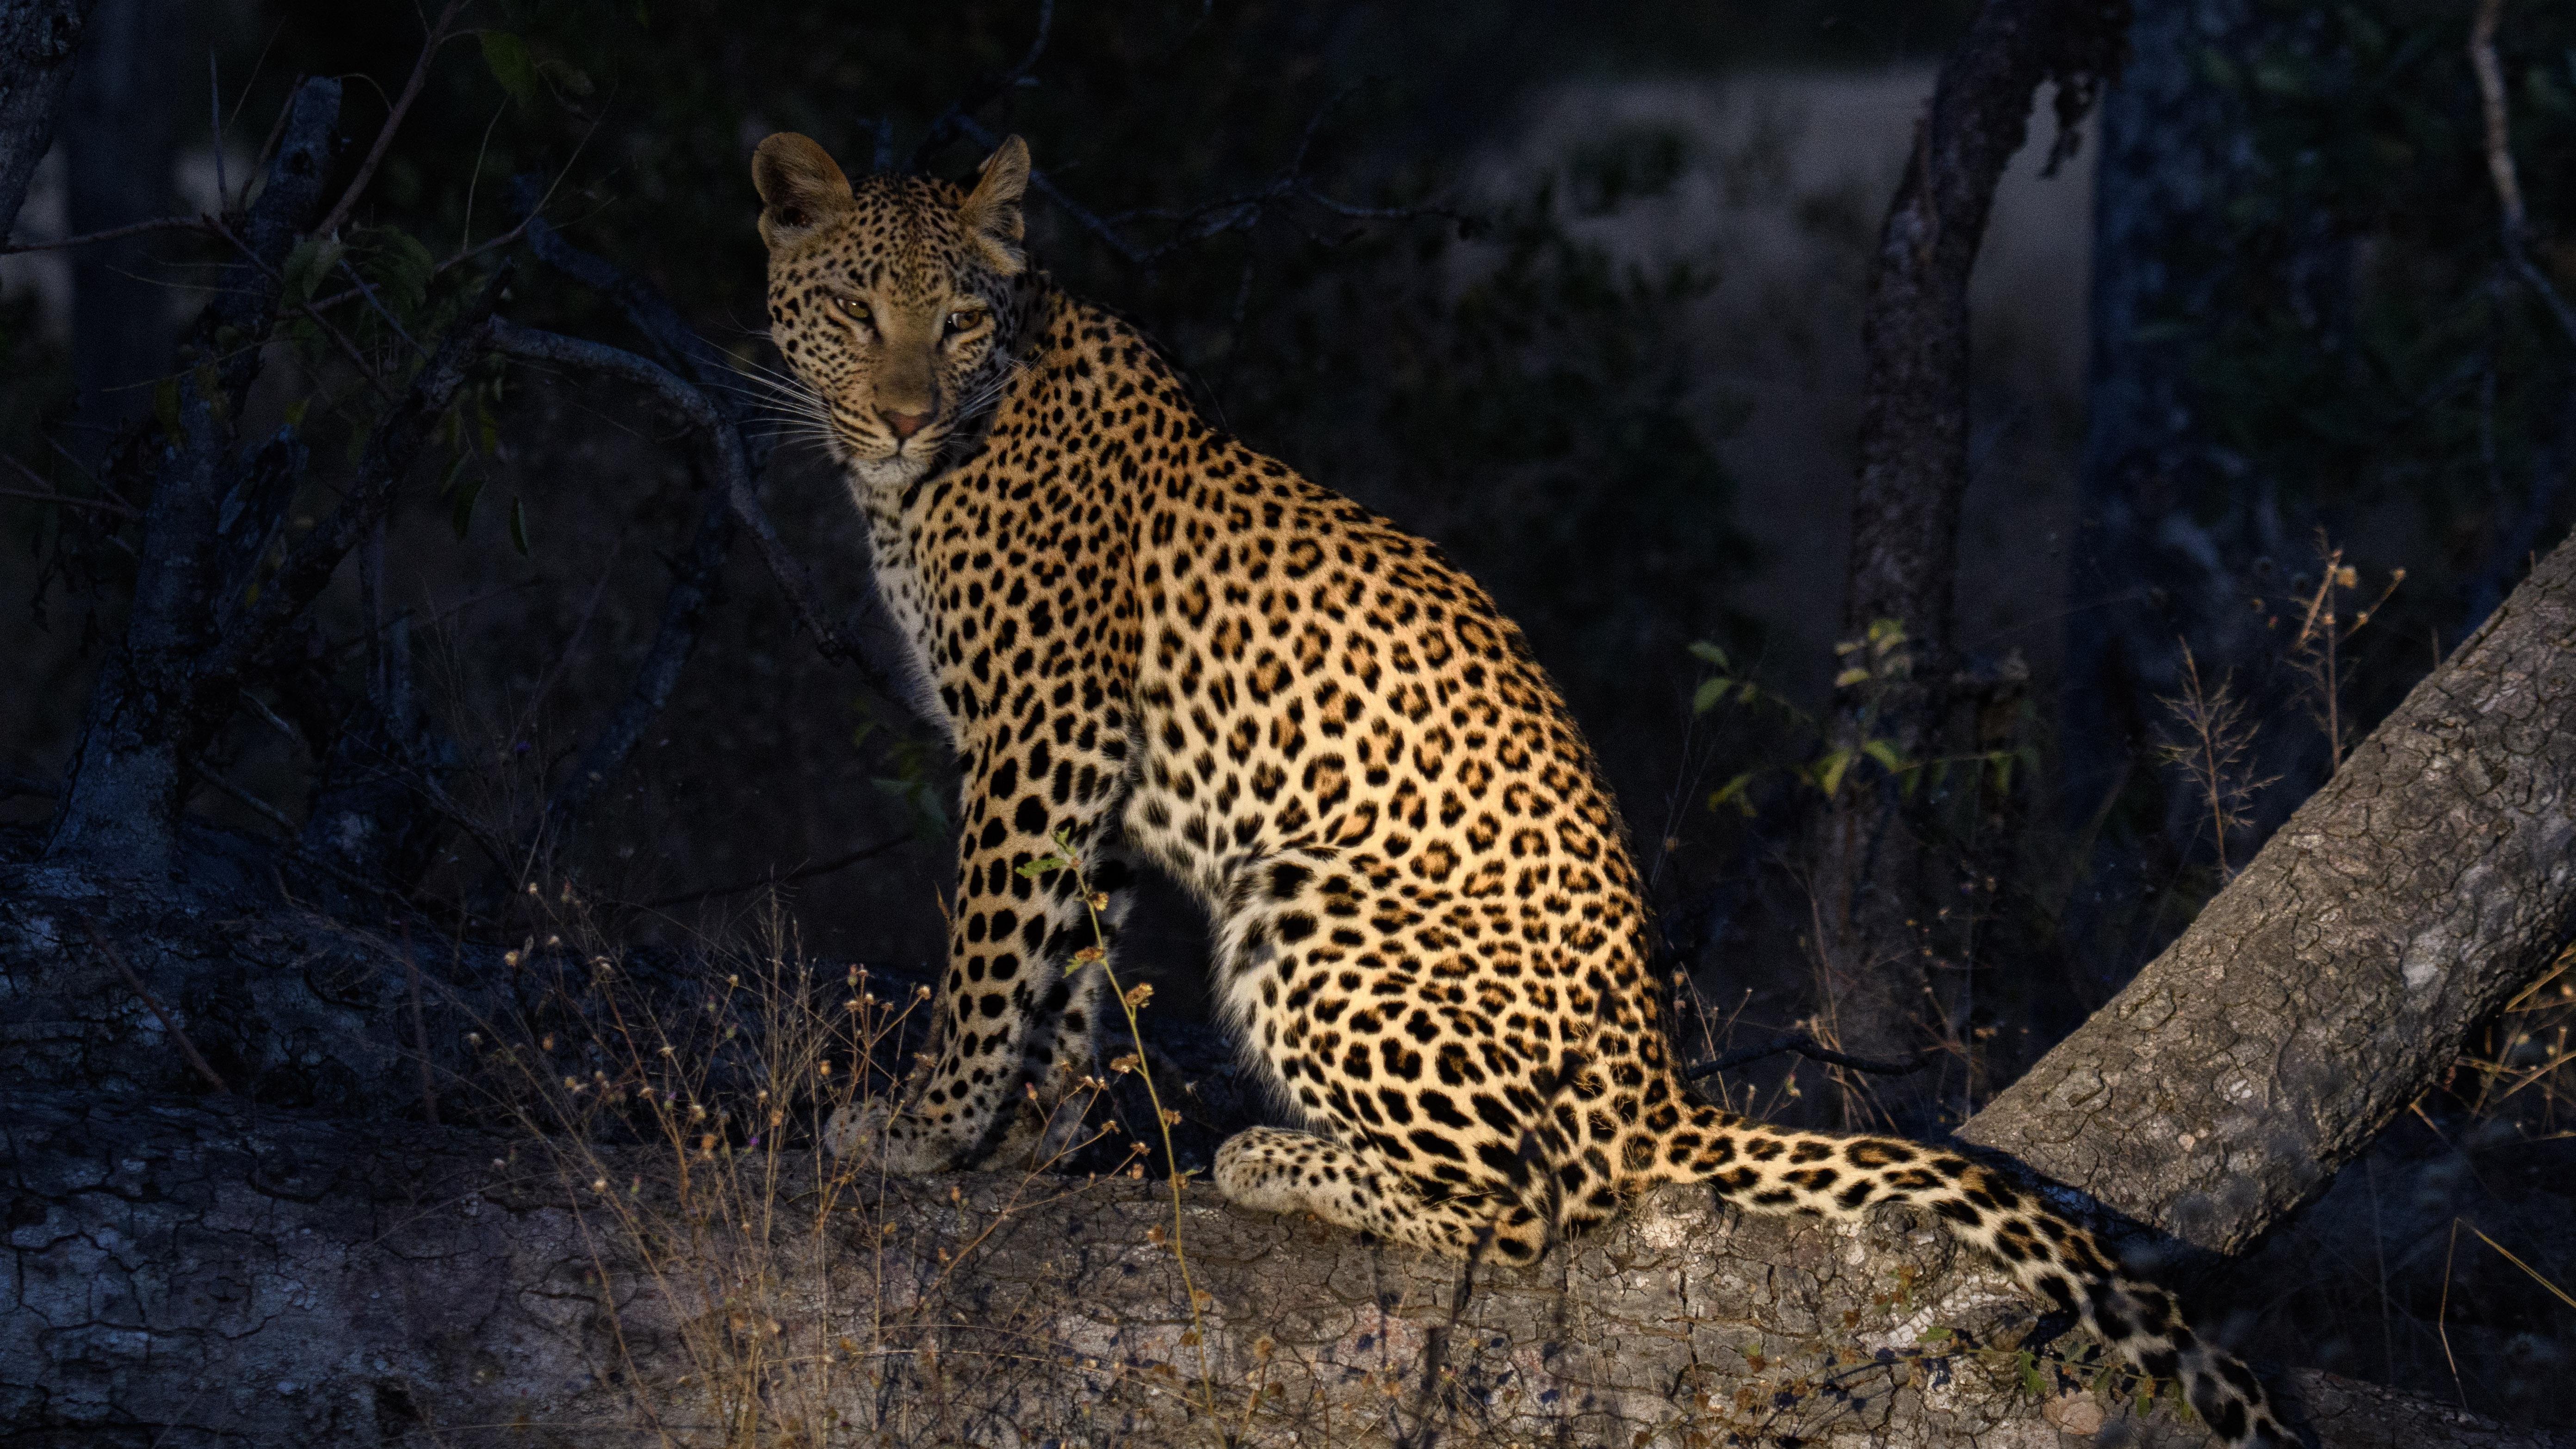 Leopard Nachtaufnahme